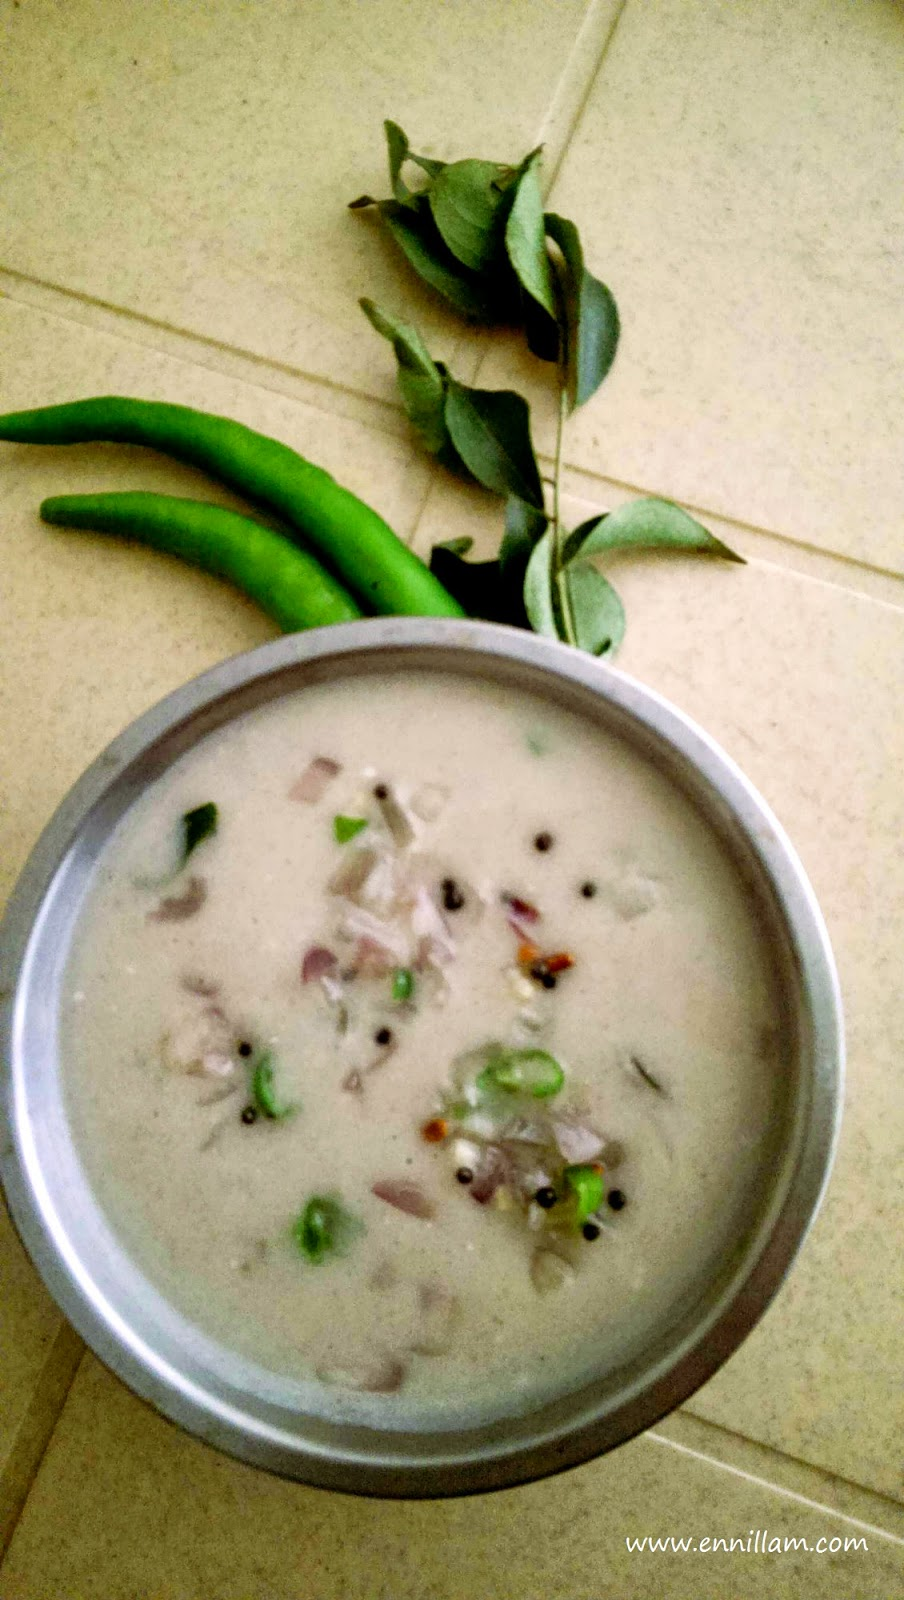 Pearl millet porridge